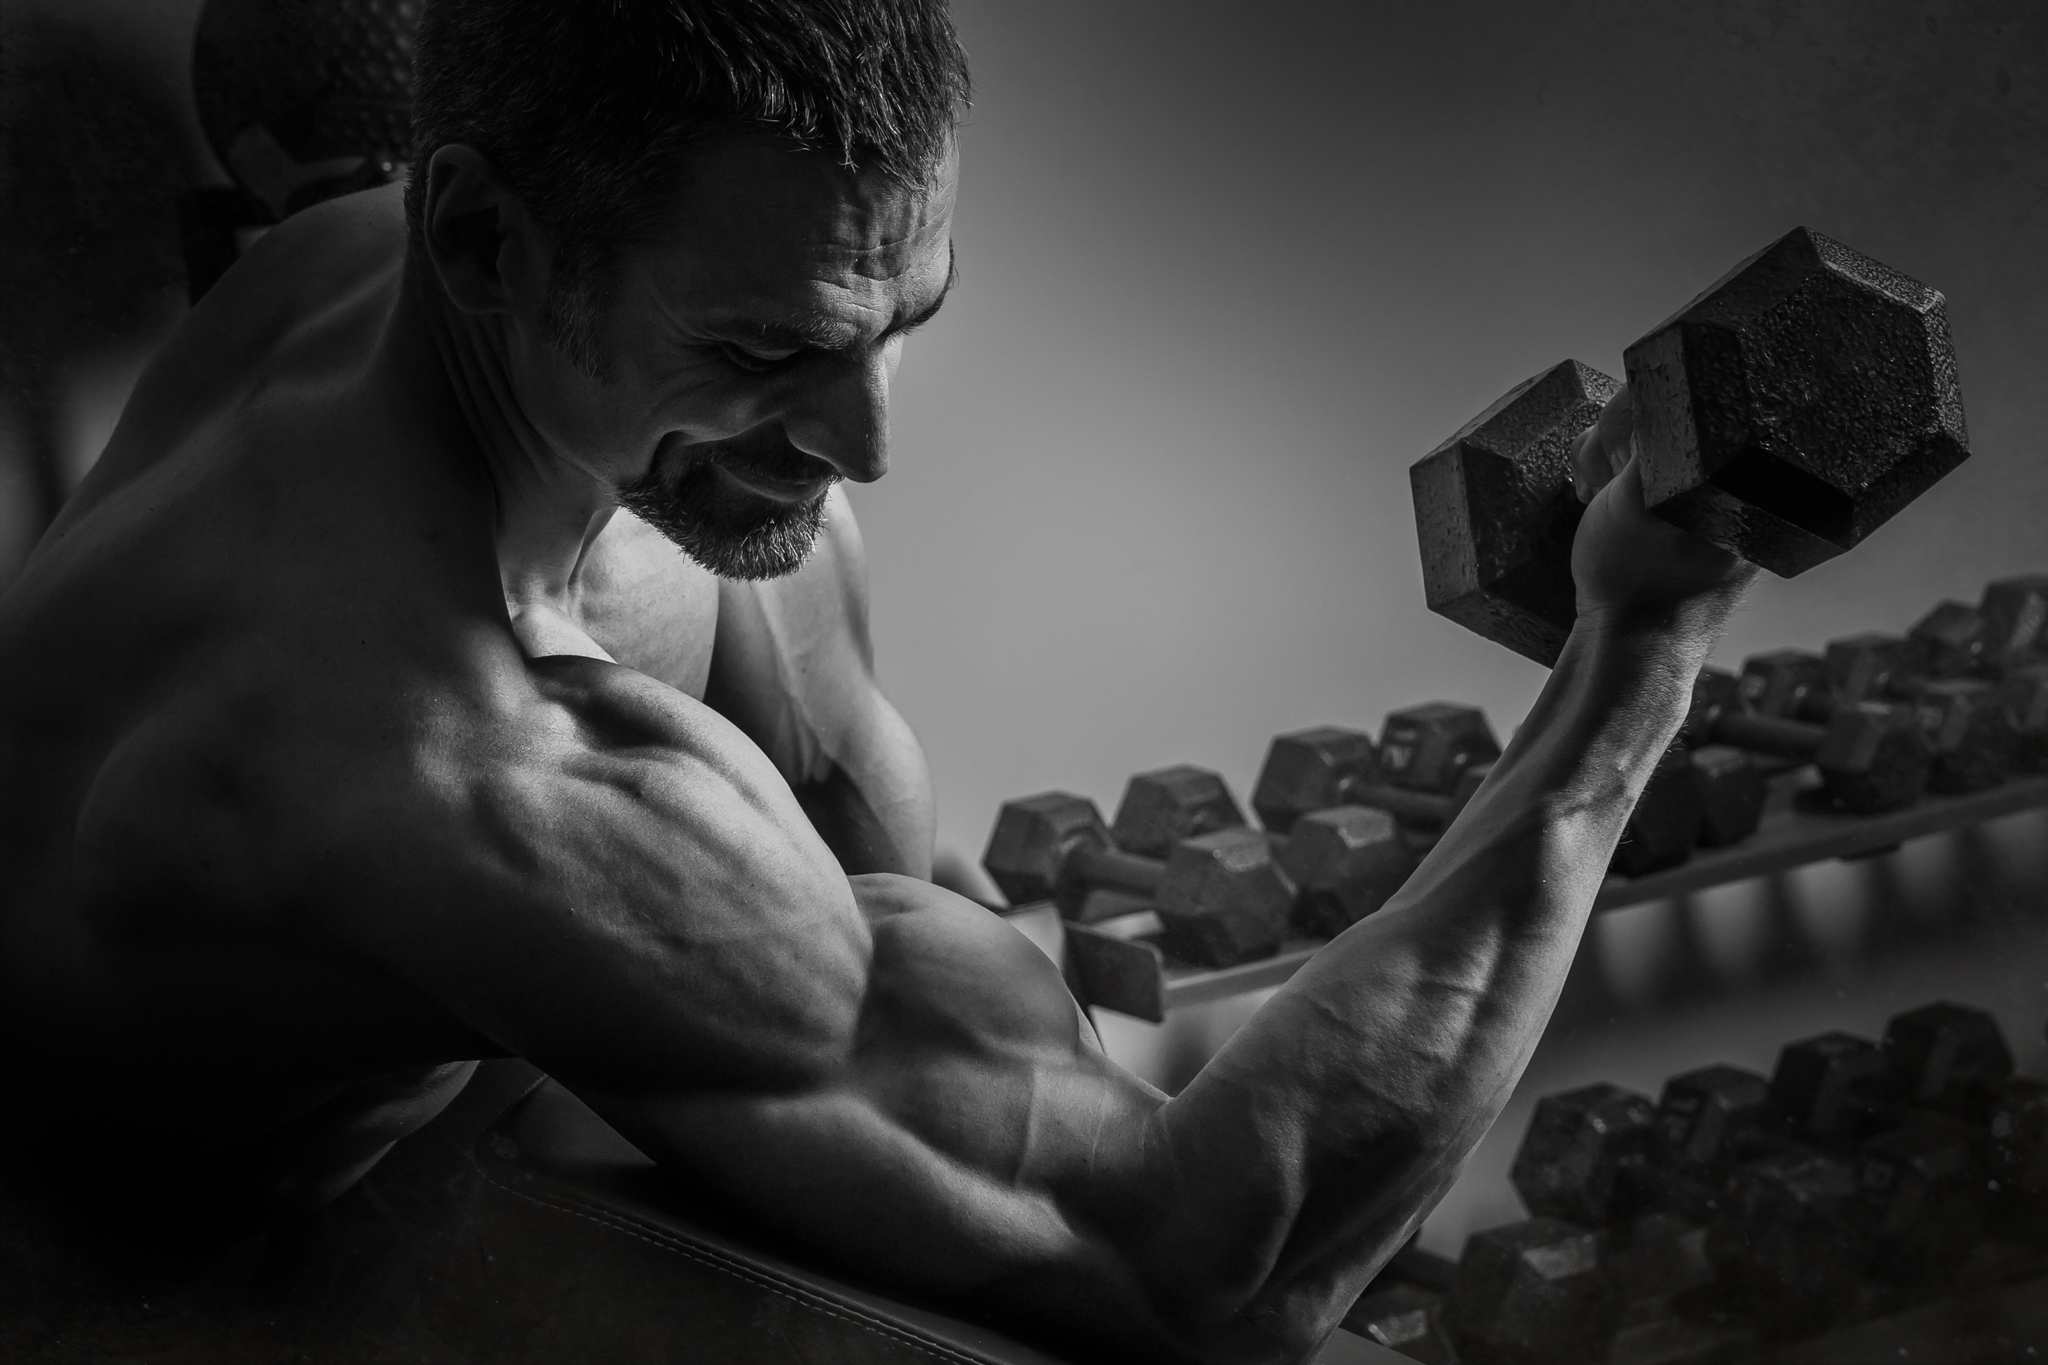 dover-new-hampshire-boston-fitness-photographer-photography-studio-07.jpg